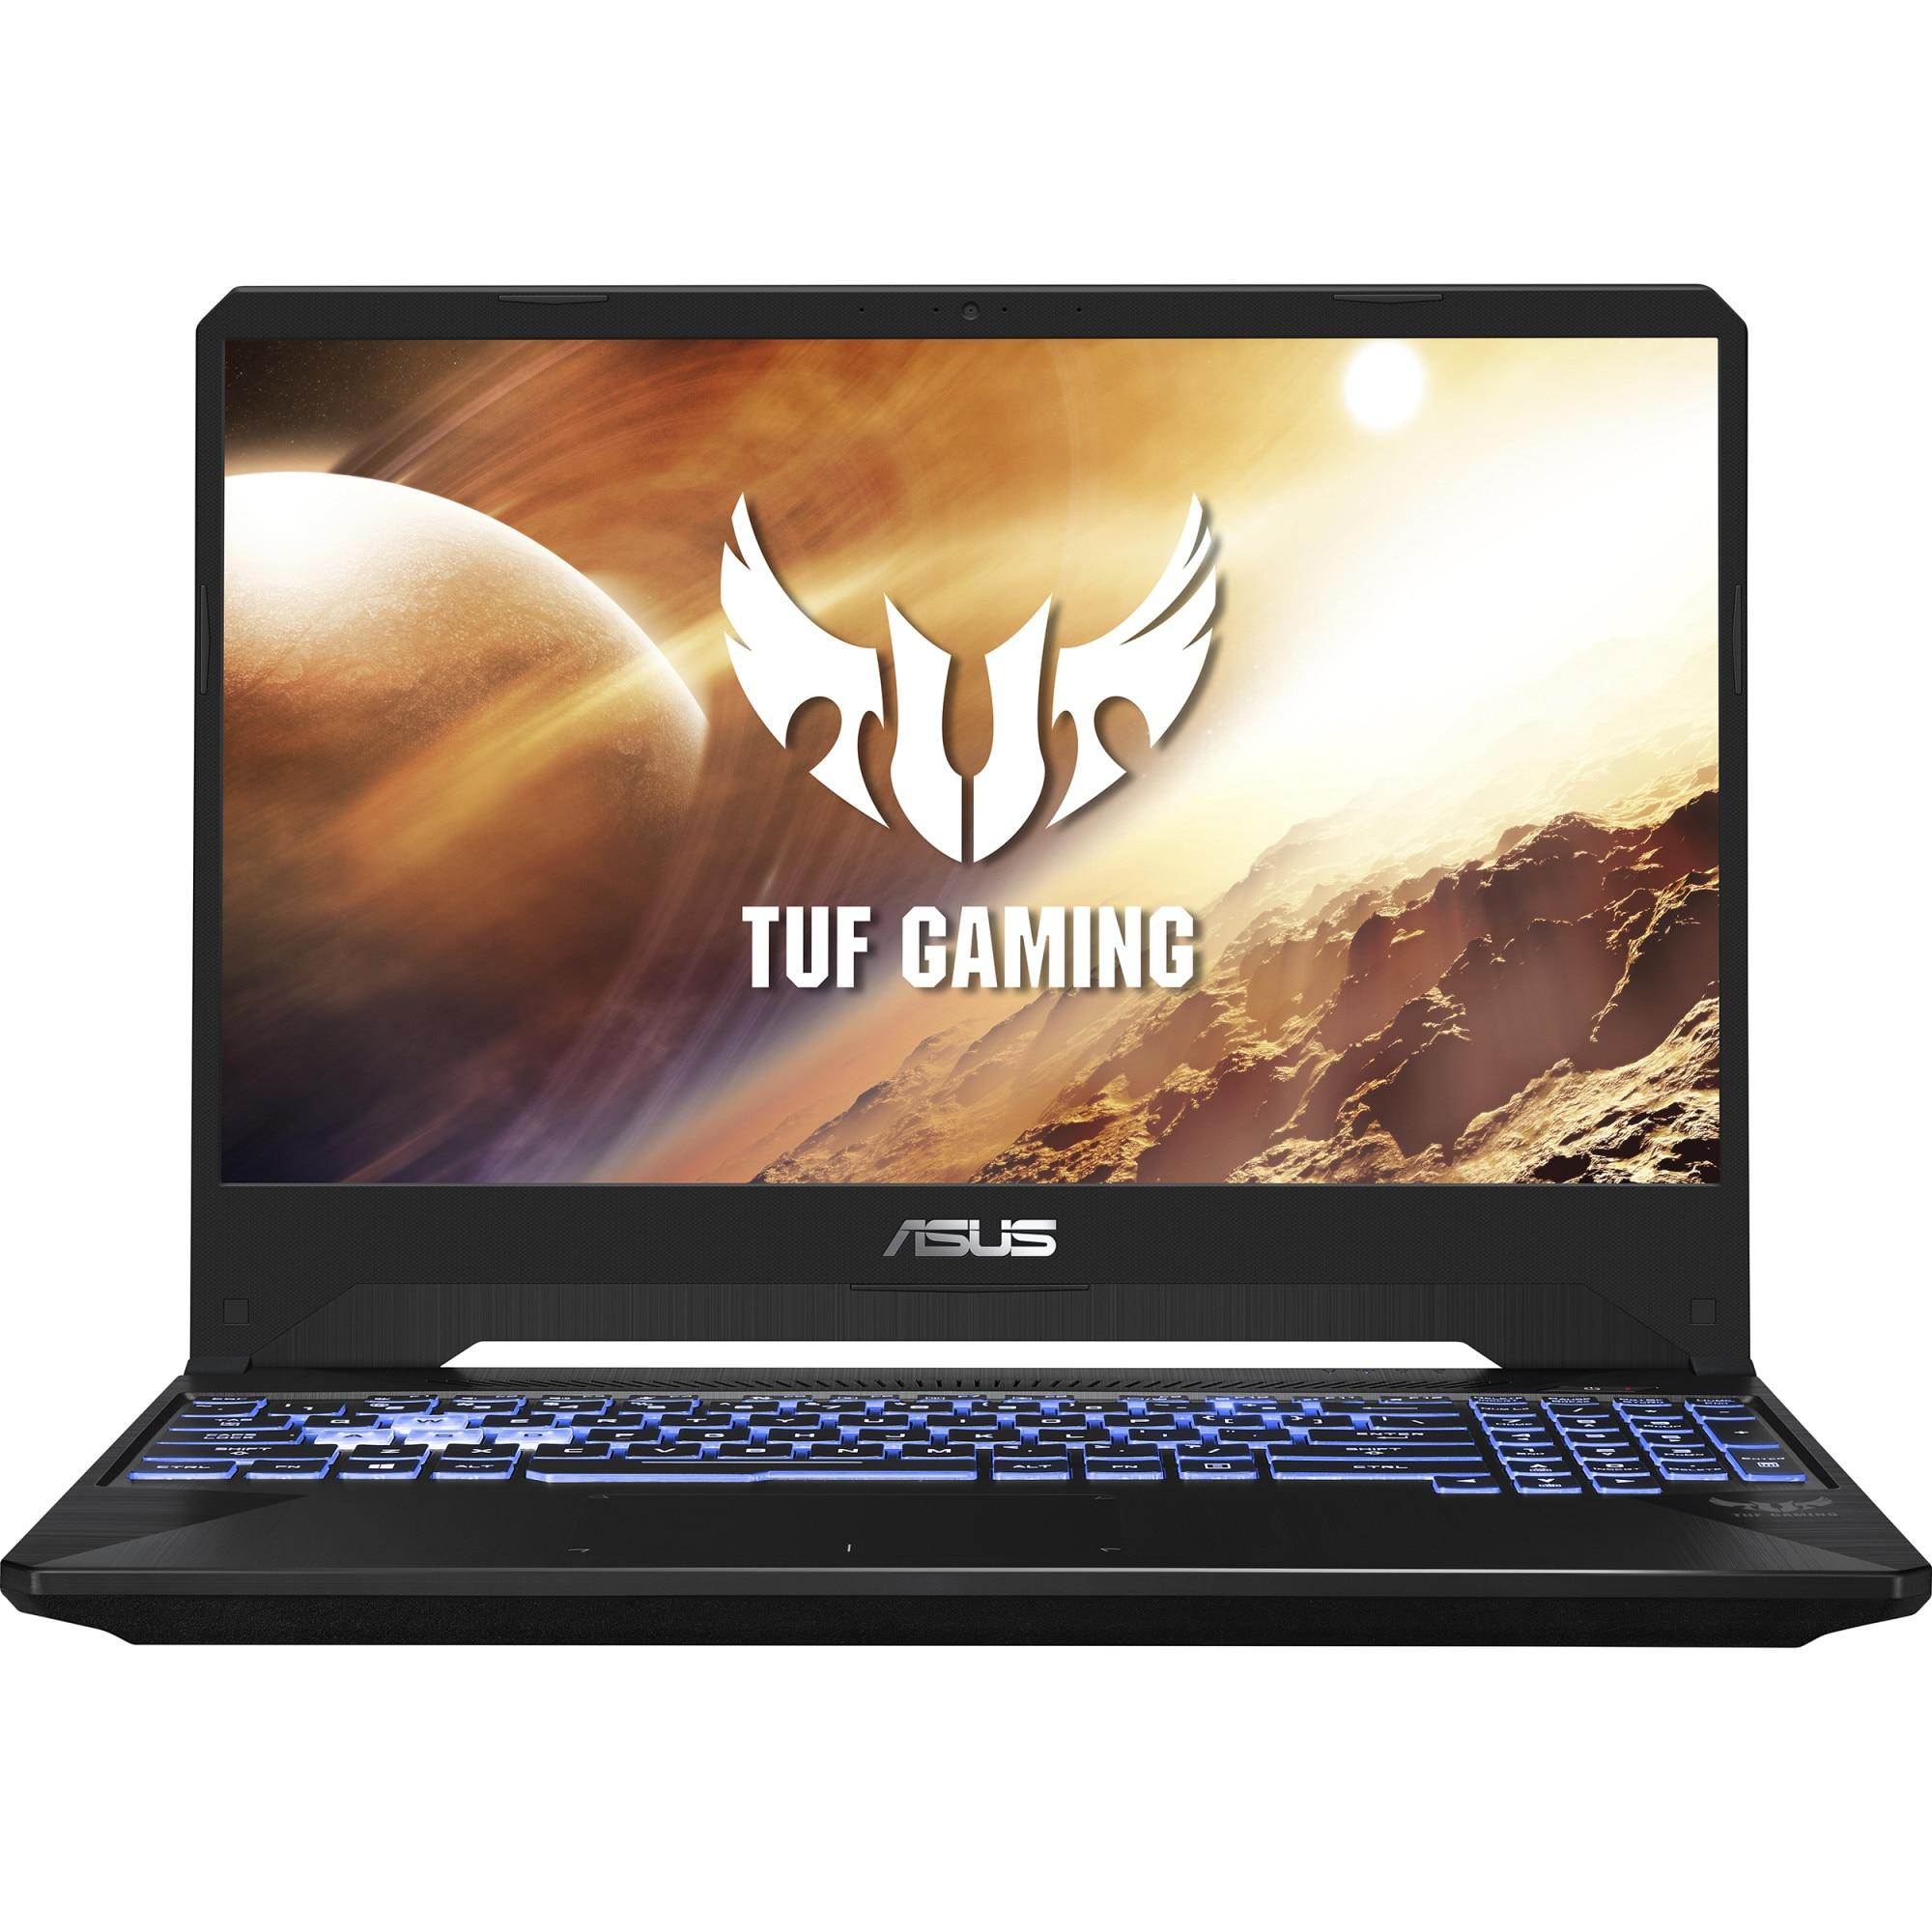 "Fotografie Laptop Gaming ASUS TUF FX705DT cu procesor AMD Ryzen 5 3550H pana la 3.70 GHz, 17.3"", Full HD, IPS, 8GB, 512GB SSD, NVIDIA GeForce GTX 1650 4GB, Free DOS, Stealth Black"